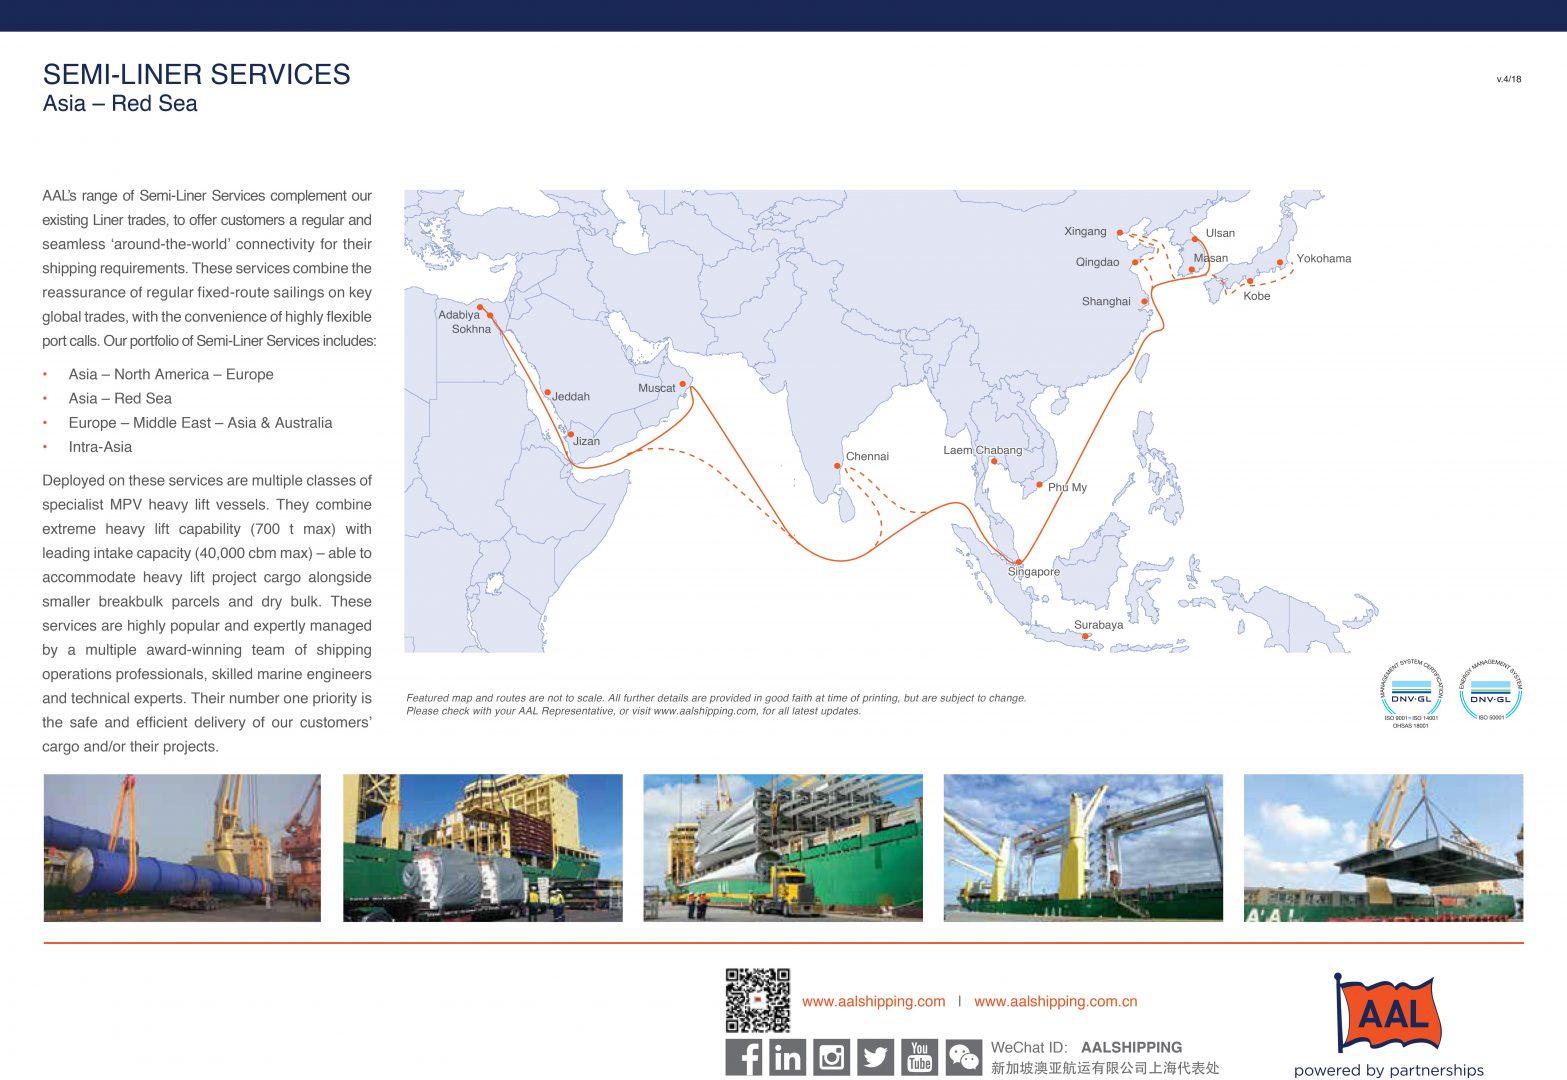 ASIA – RED SEA SEMI-LINER SERVICE ROUTE MAP